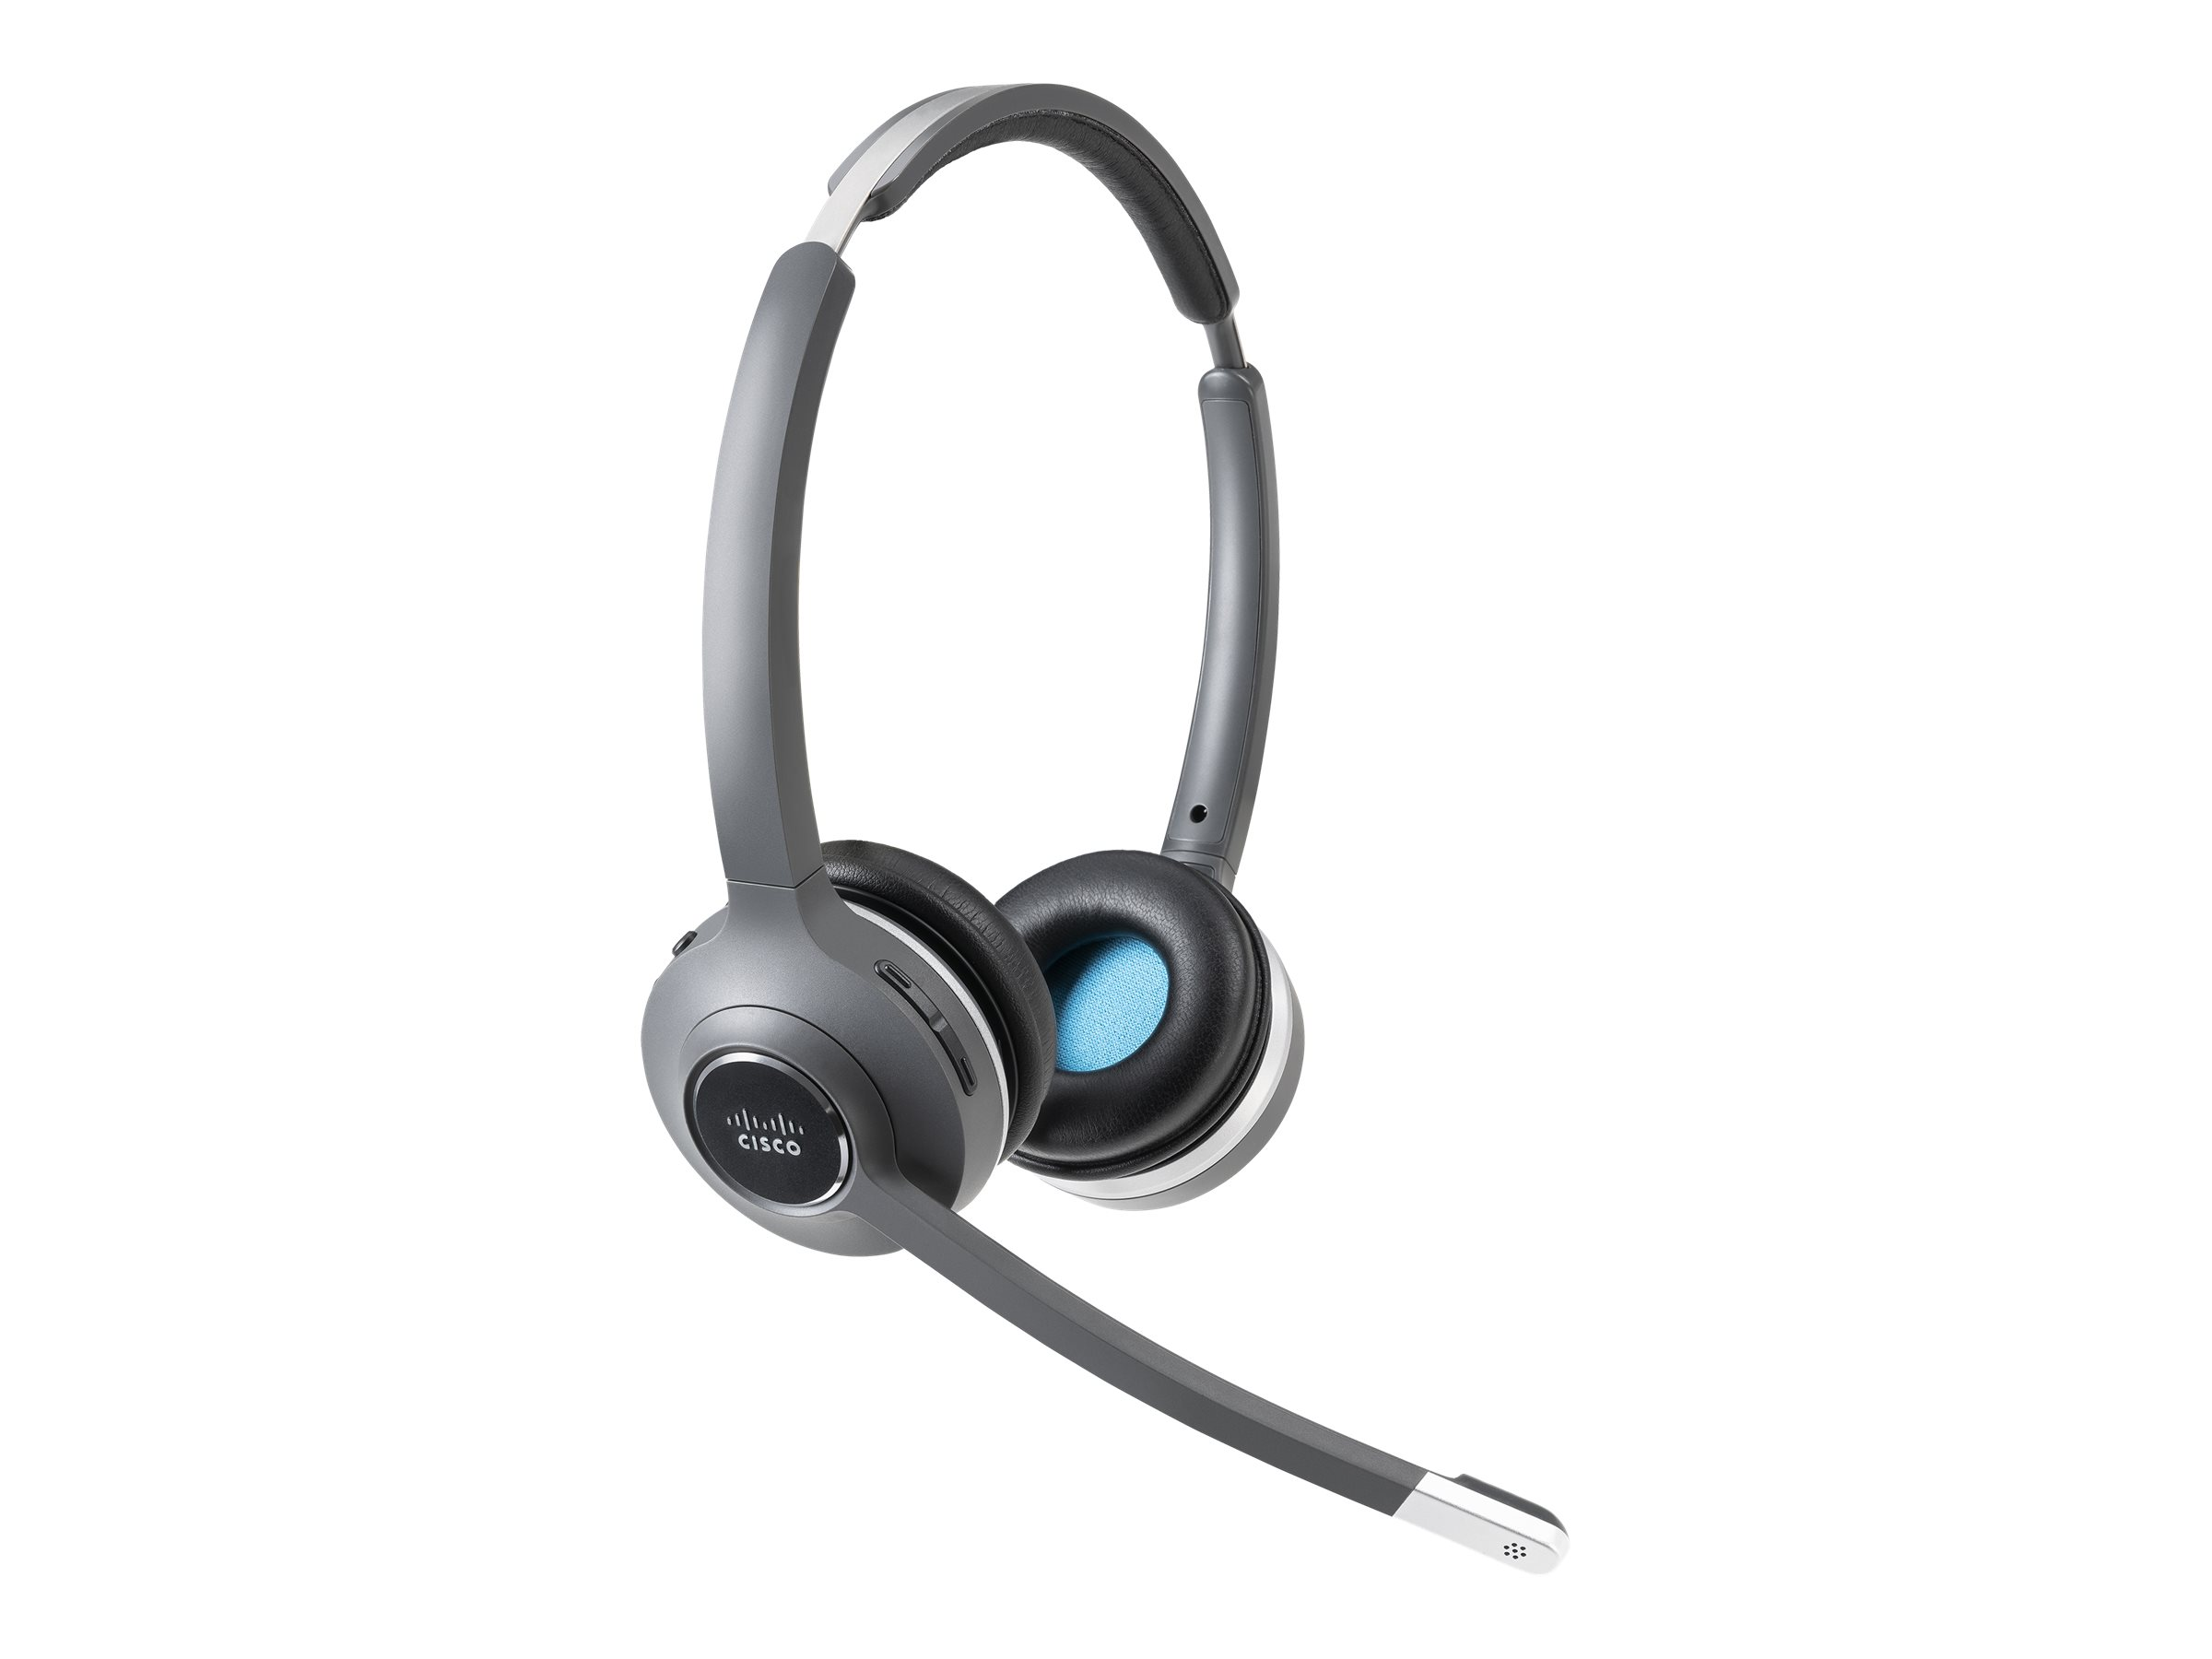 Cisco 562 Wireless Dual - Headset - On-Ear - DECT 6.0